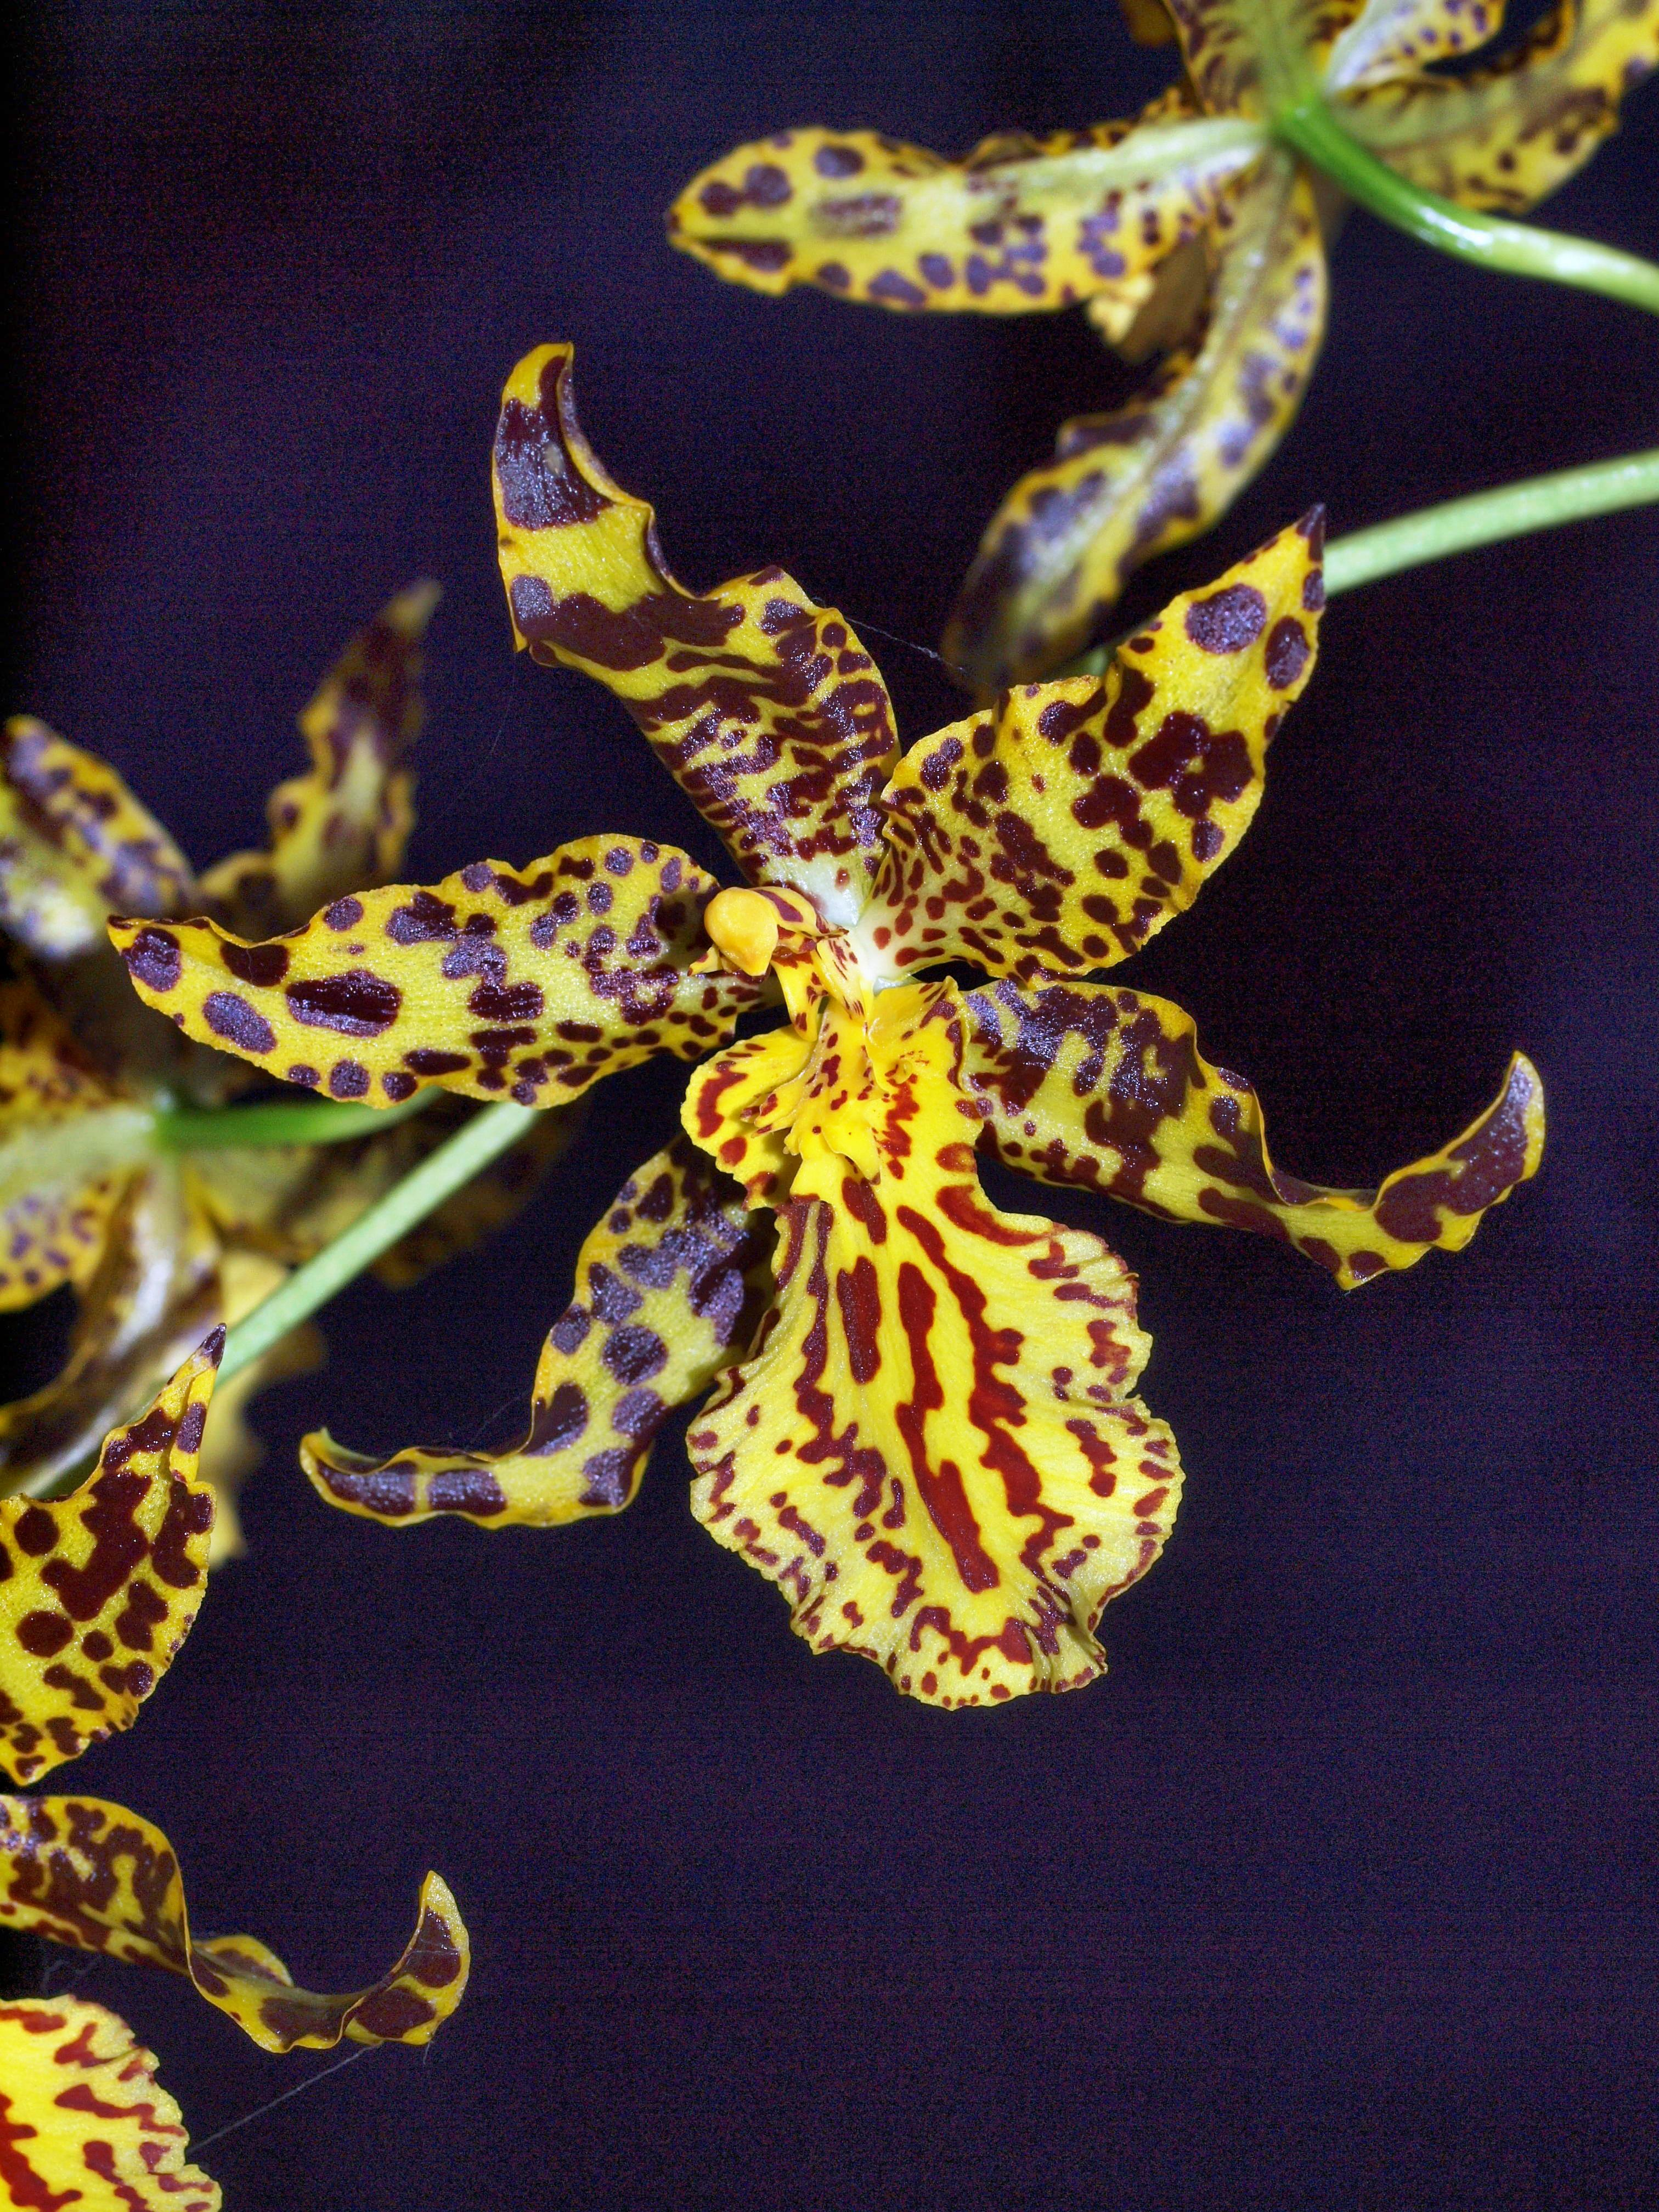 Orchid-45.jpeg